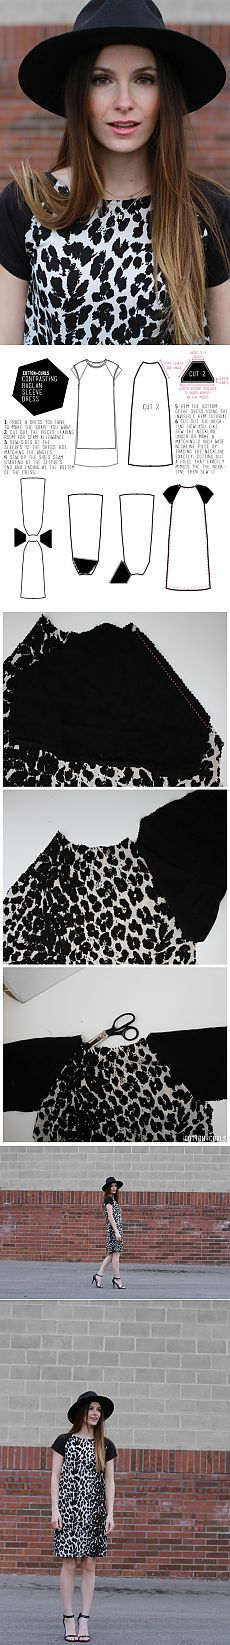 Another dress neumeyuschih stitching (Diy) / Simple patterns /